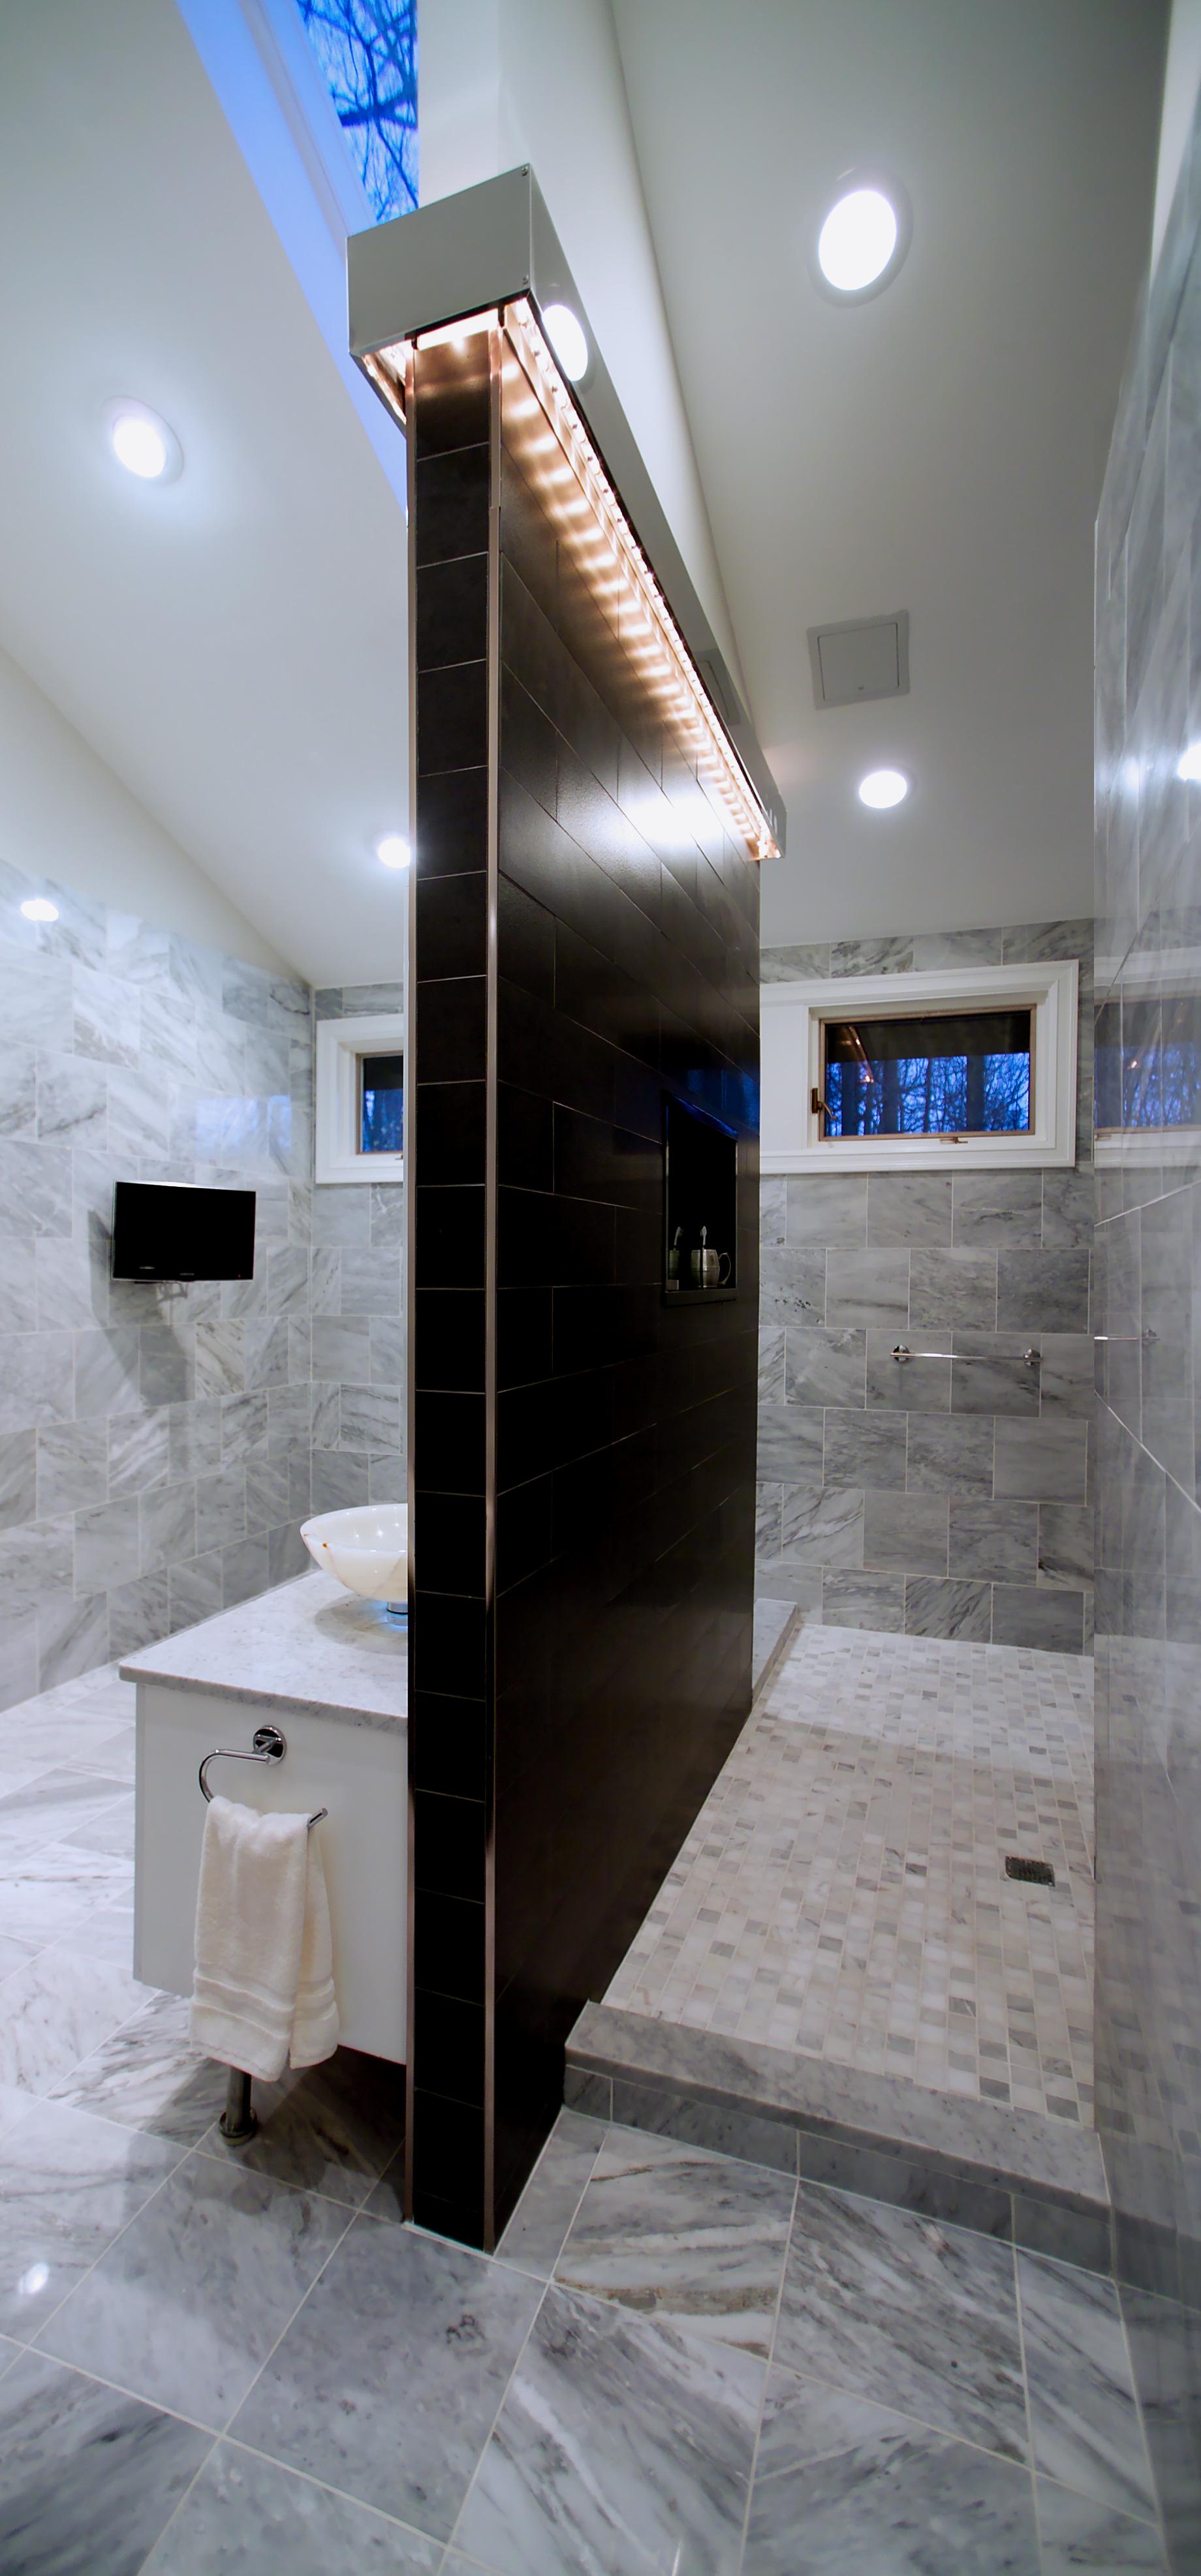 Master Bath 4 - View of Shower Area & Vanity.jpg